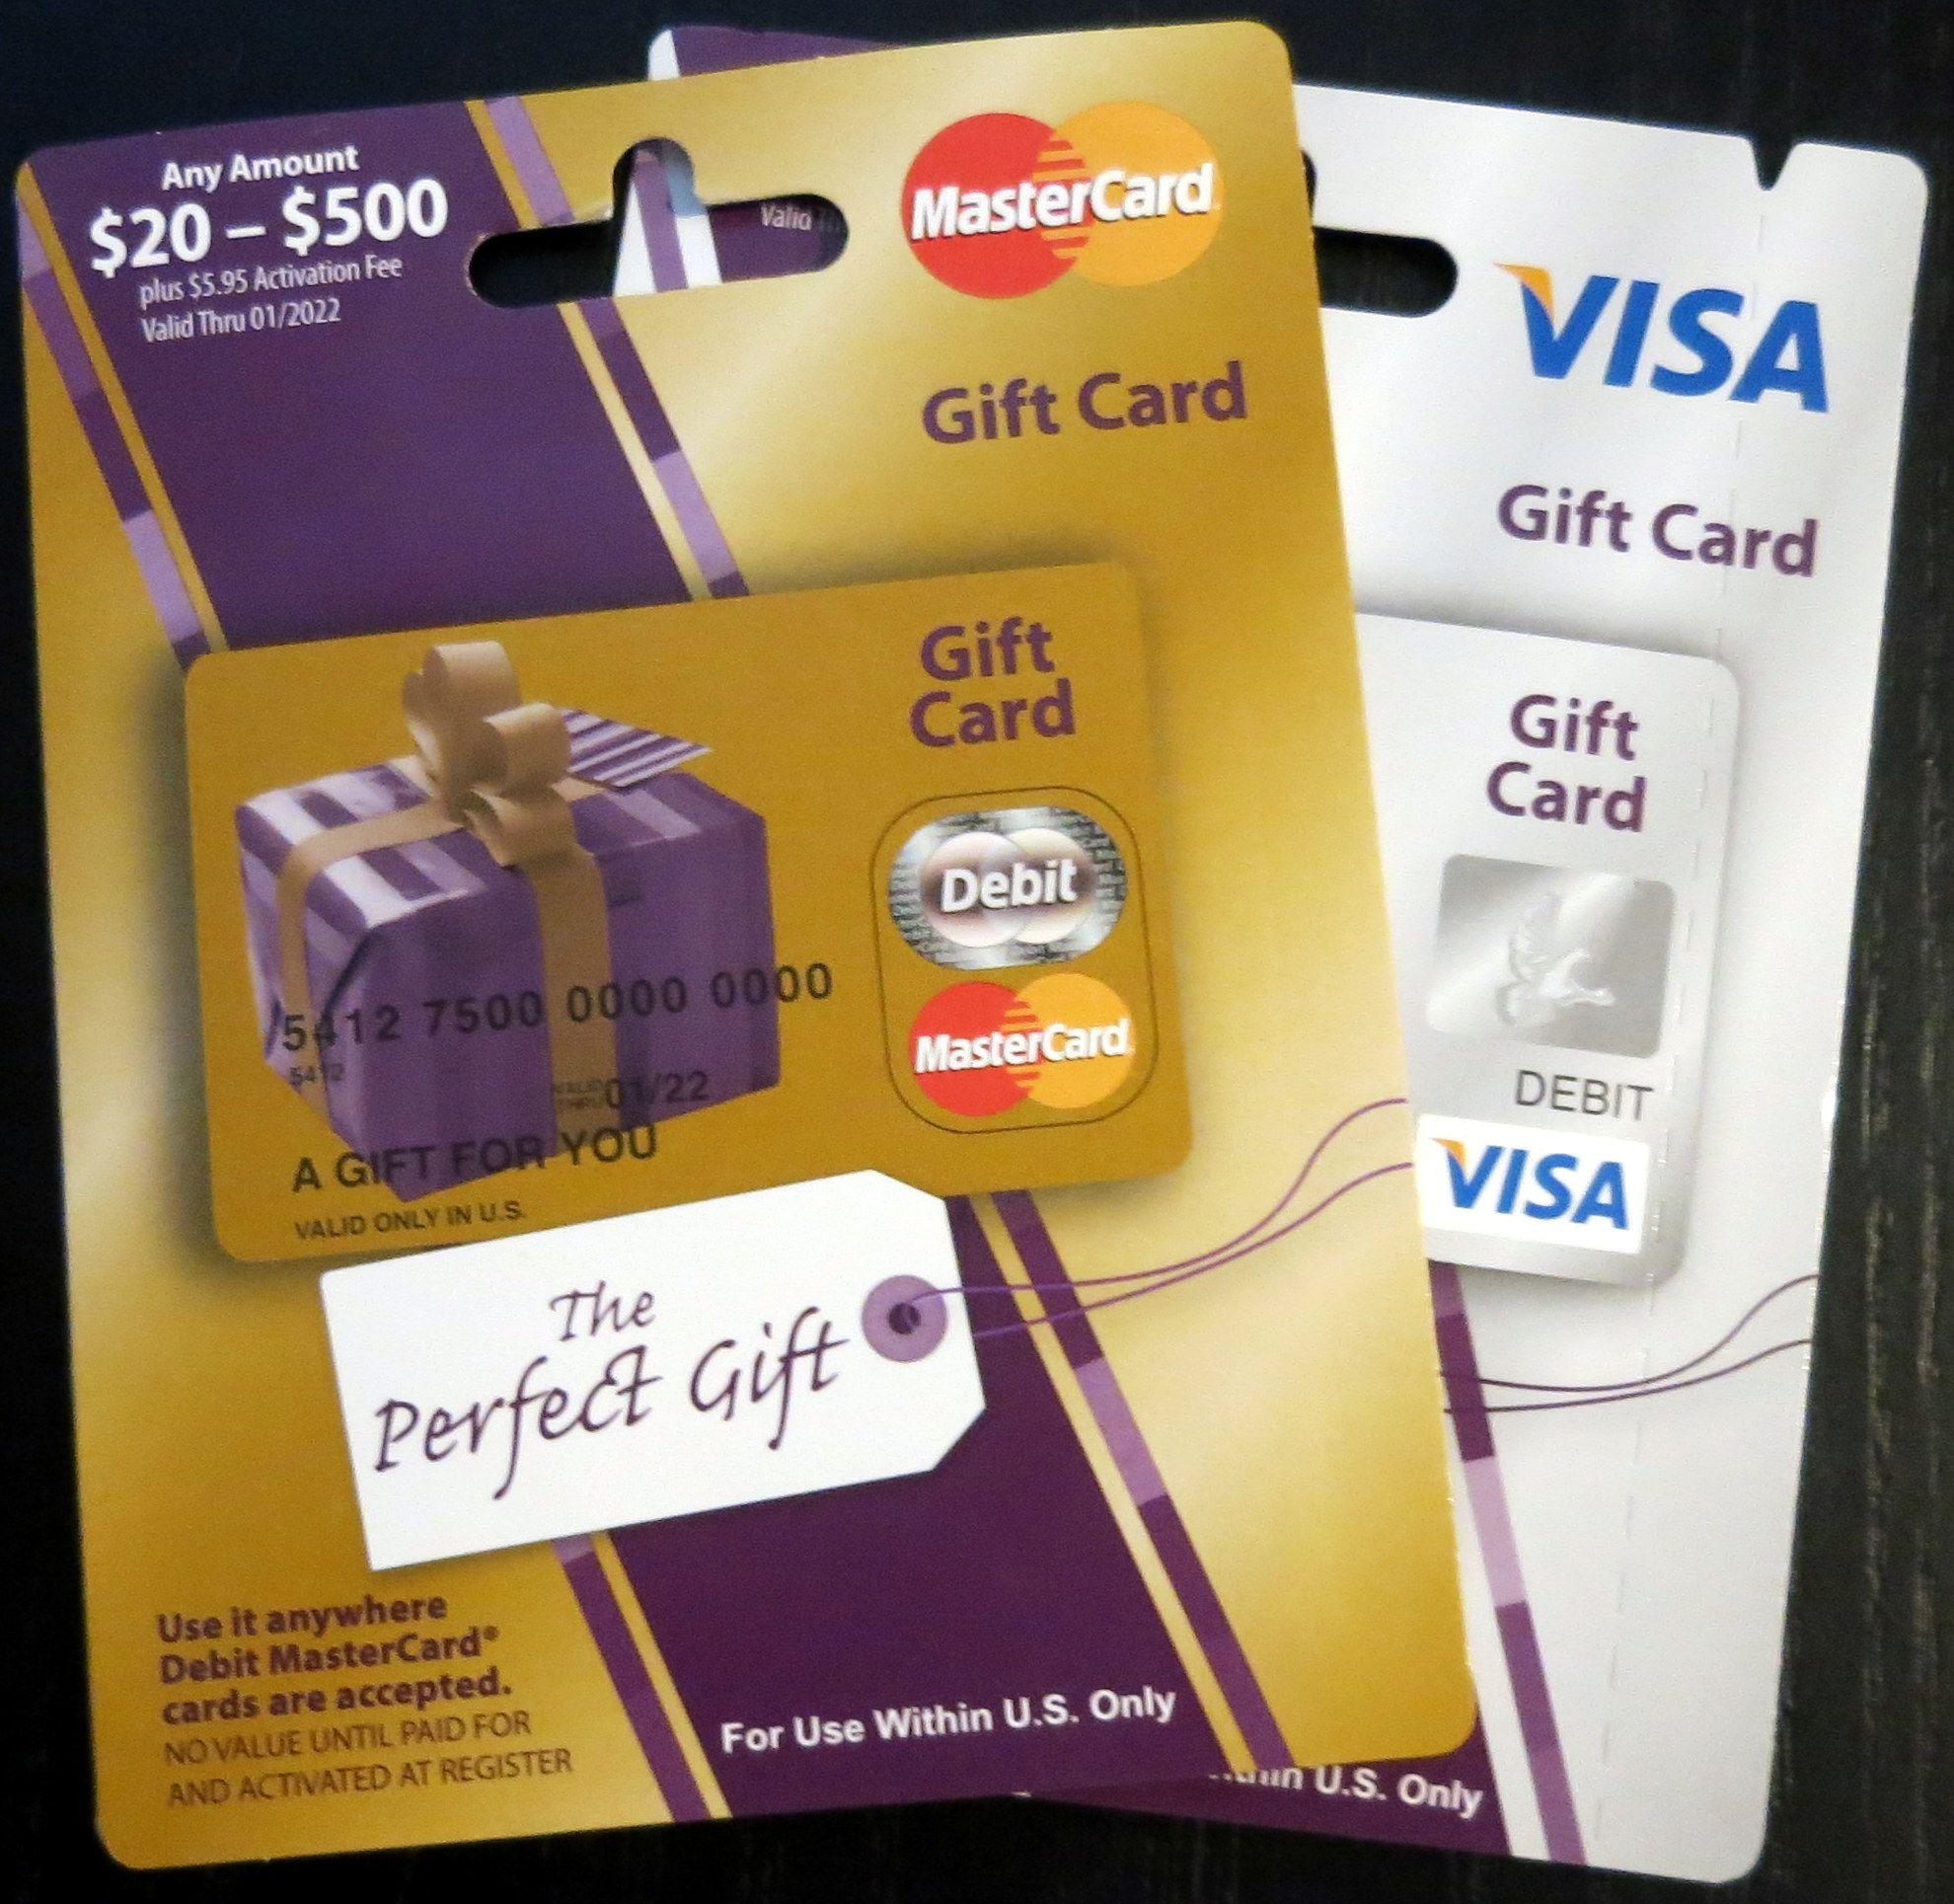 FREE $1000 mastercard gift card